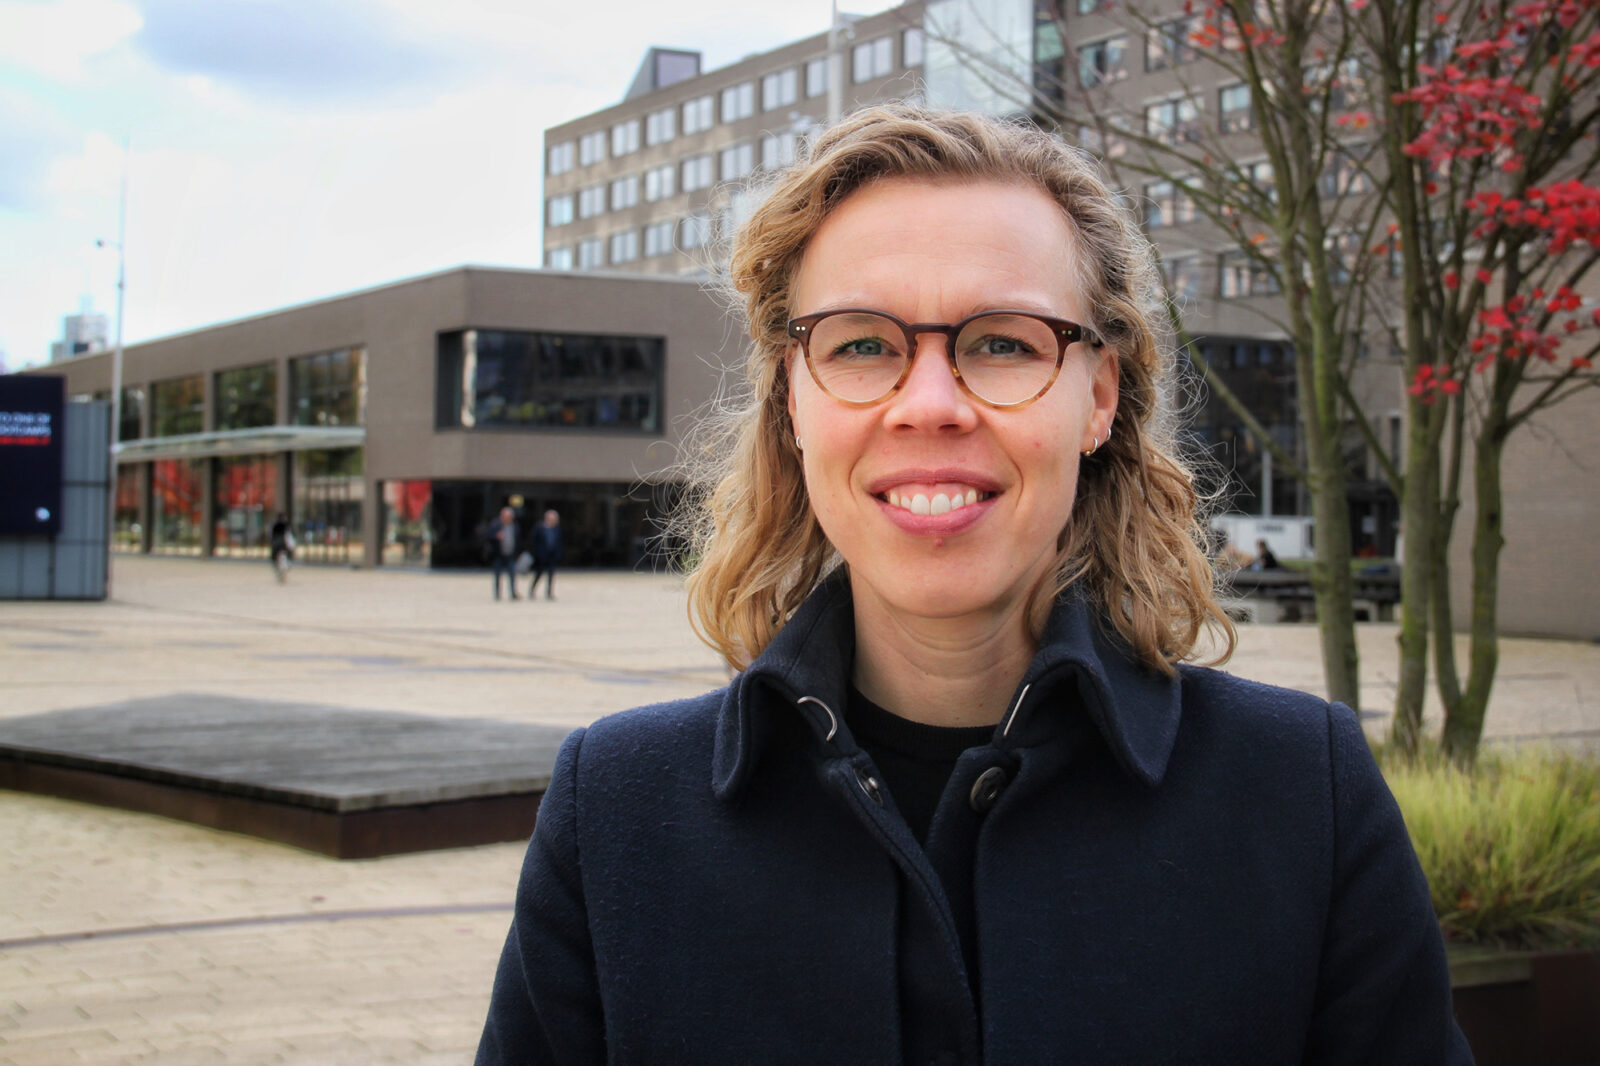 career advisor Laura de Reus – Milena Chopova